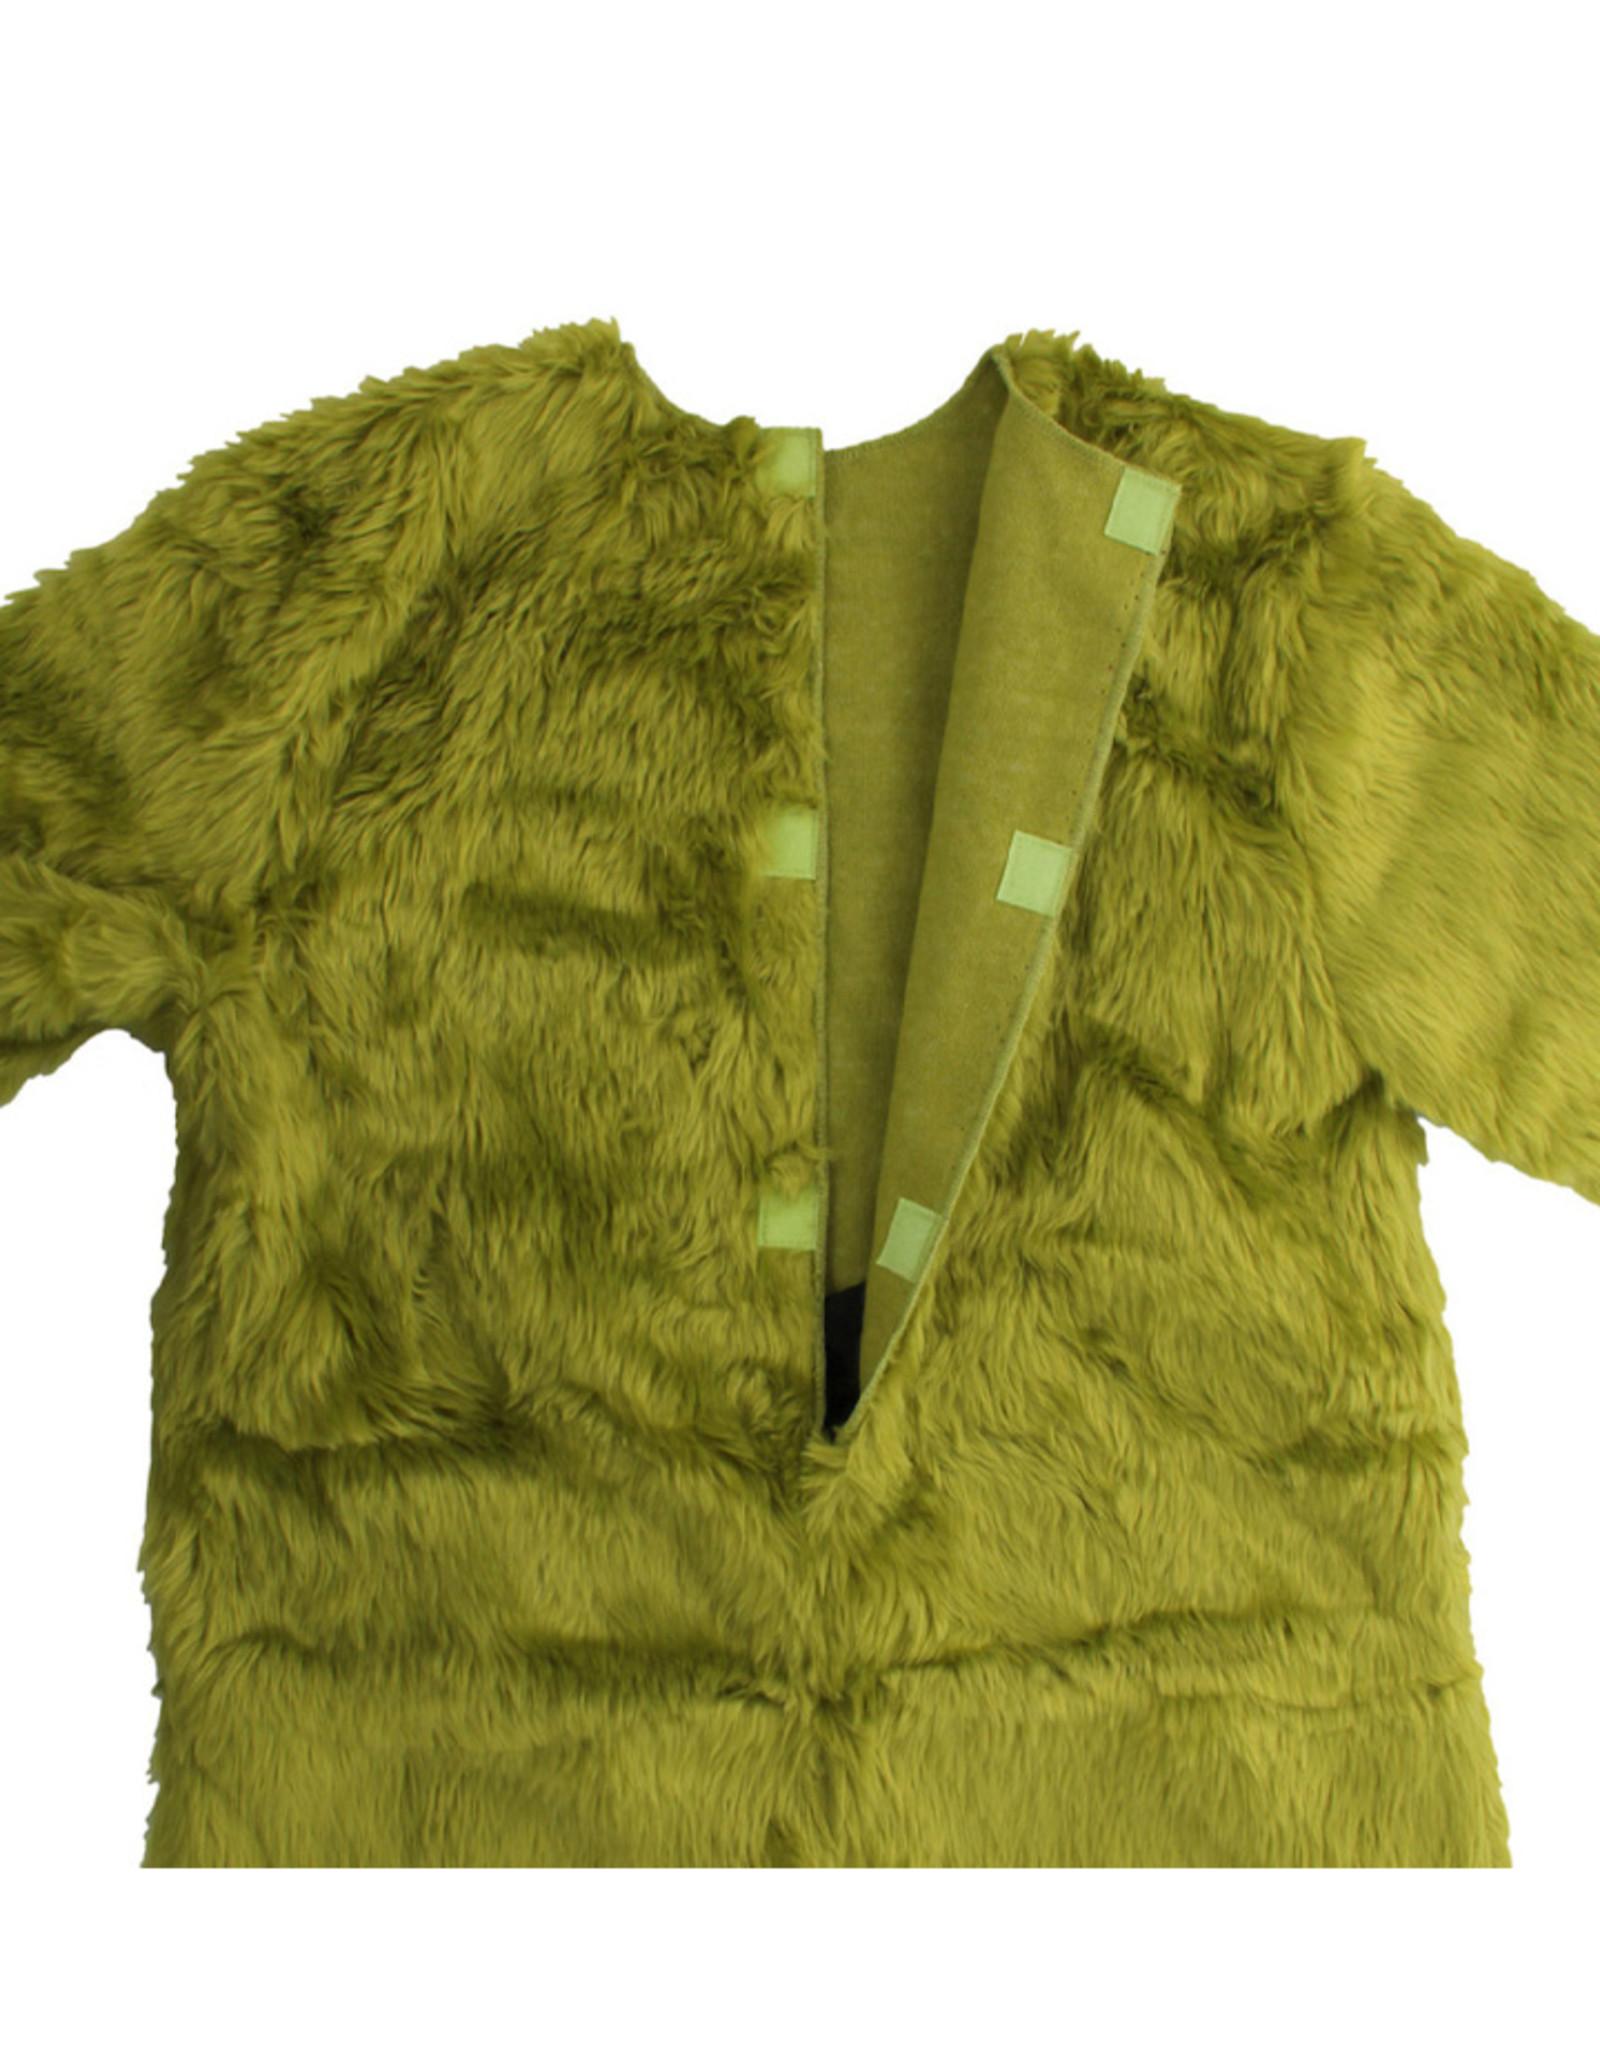 ELOPE The Grinch Costume - Men's